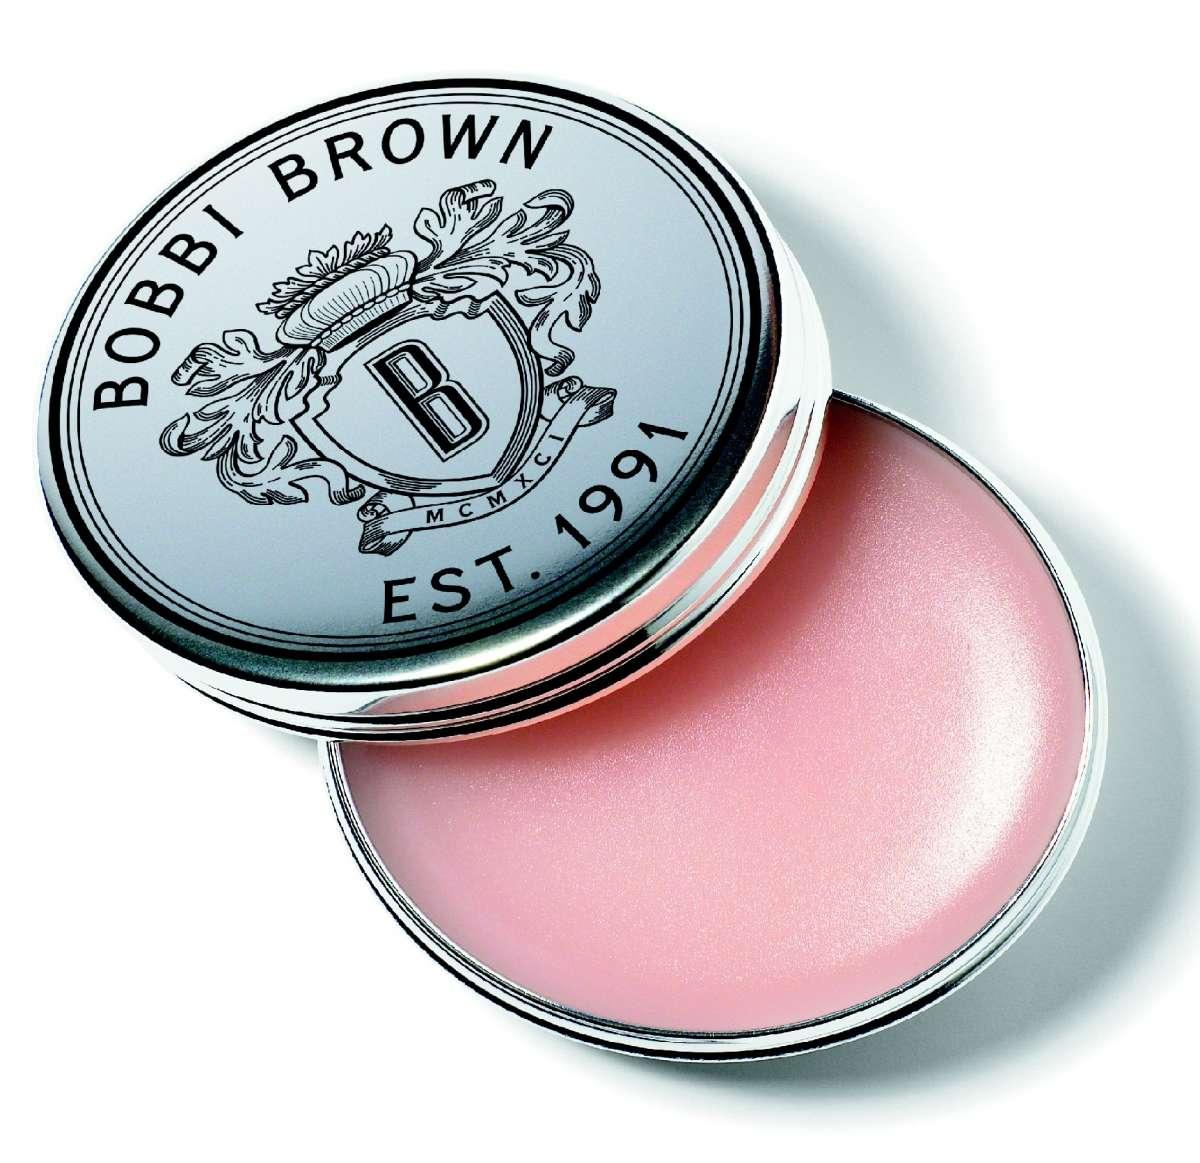 lipbalm של בובי בראון 110שח להשיג ברשת חנויות בובי בראון